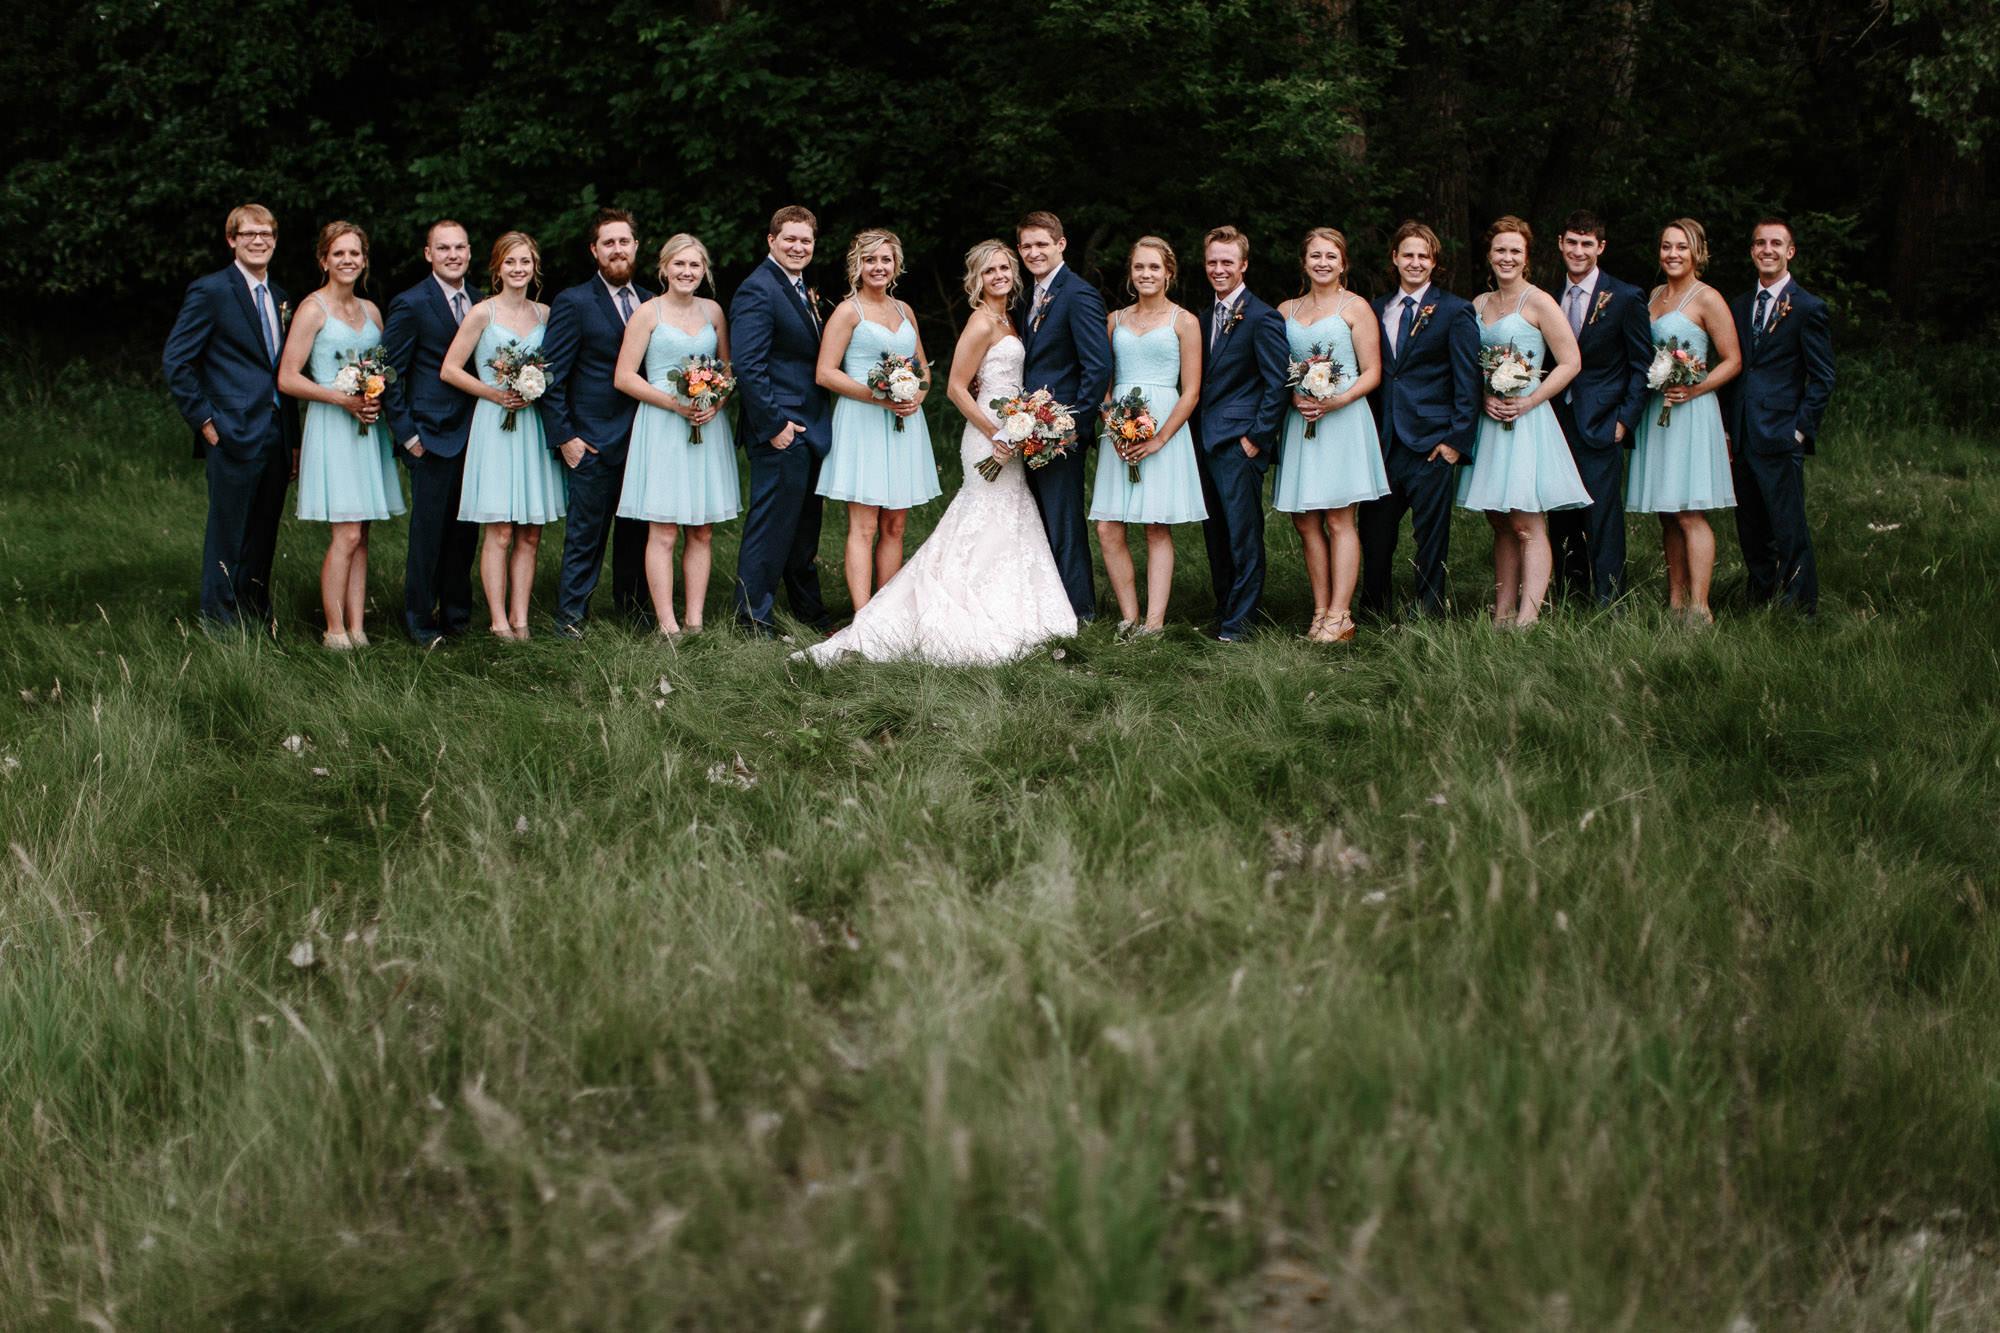 meadow-barn-wedding-sioux-falls-south-dakota-romantic-adventerous-michael-liedtke-photography040.jpg